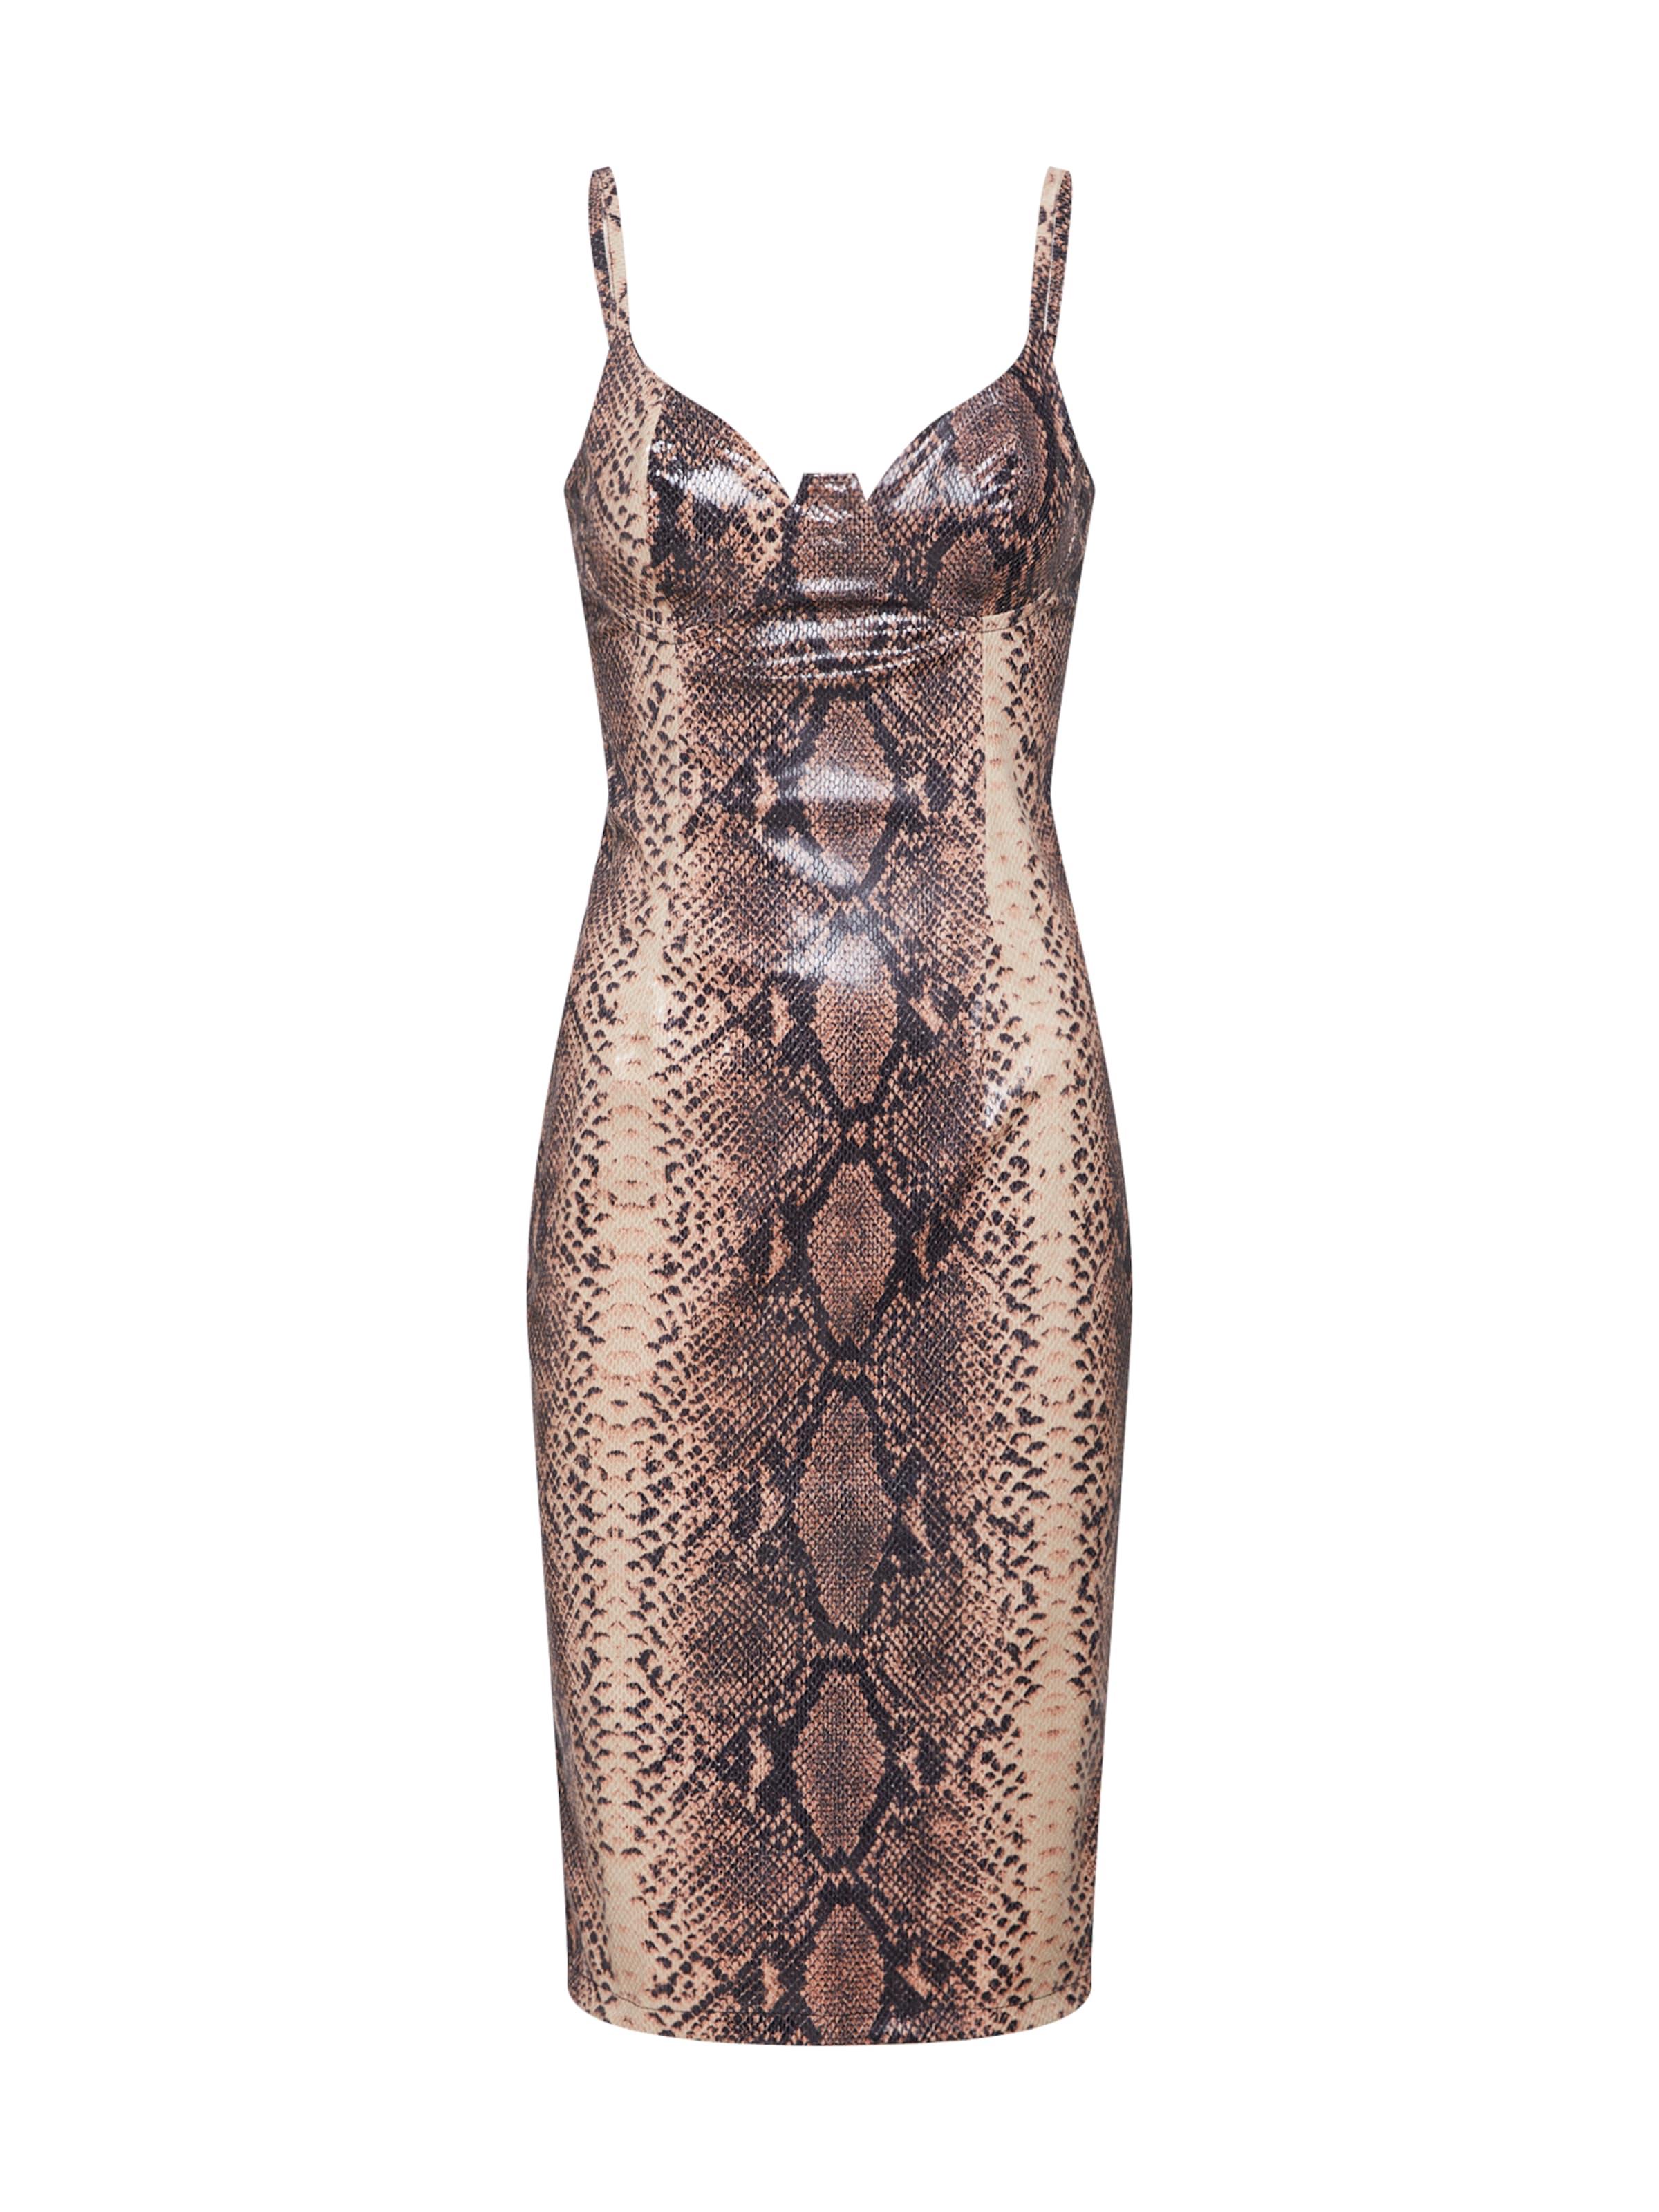 In Snake' Dress Pu Midi Missguided Braun Kleid 'strappy CshrtQd